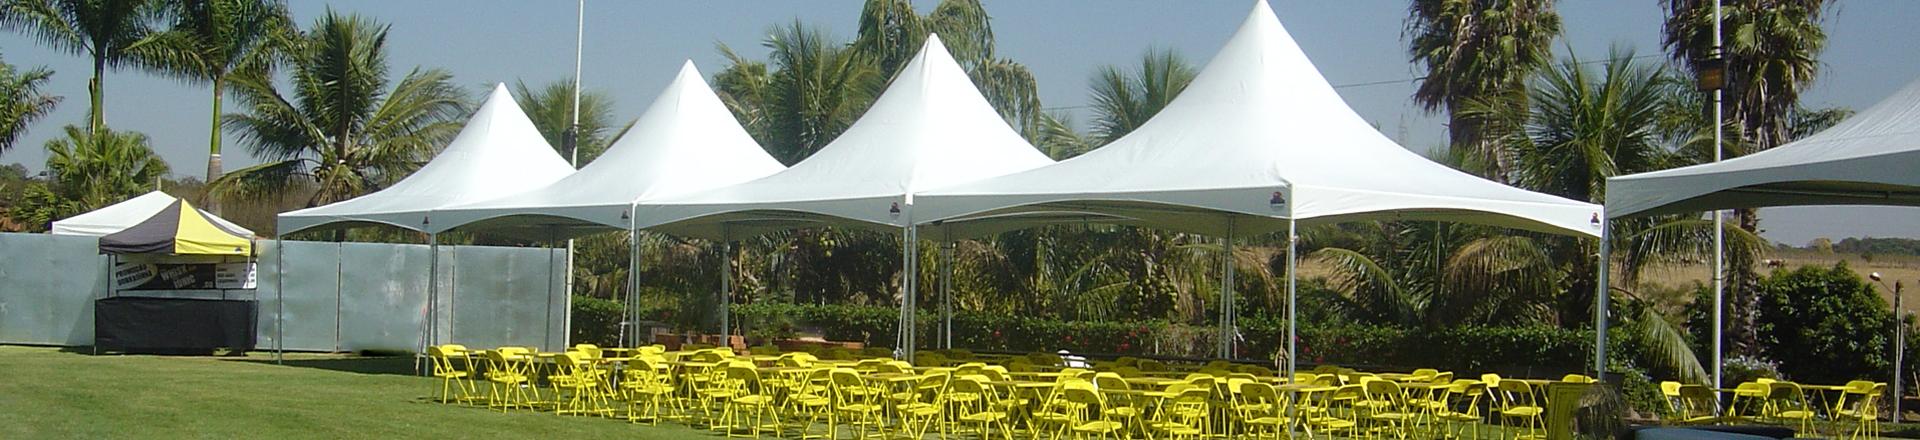 Banner-Site-Tendas-2